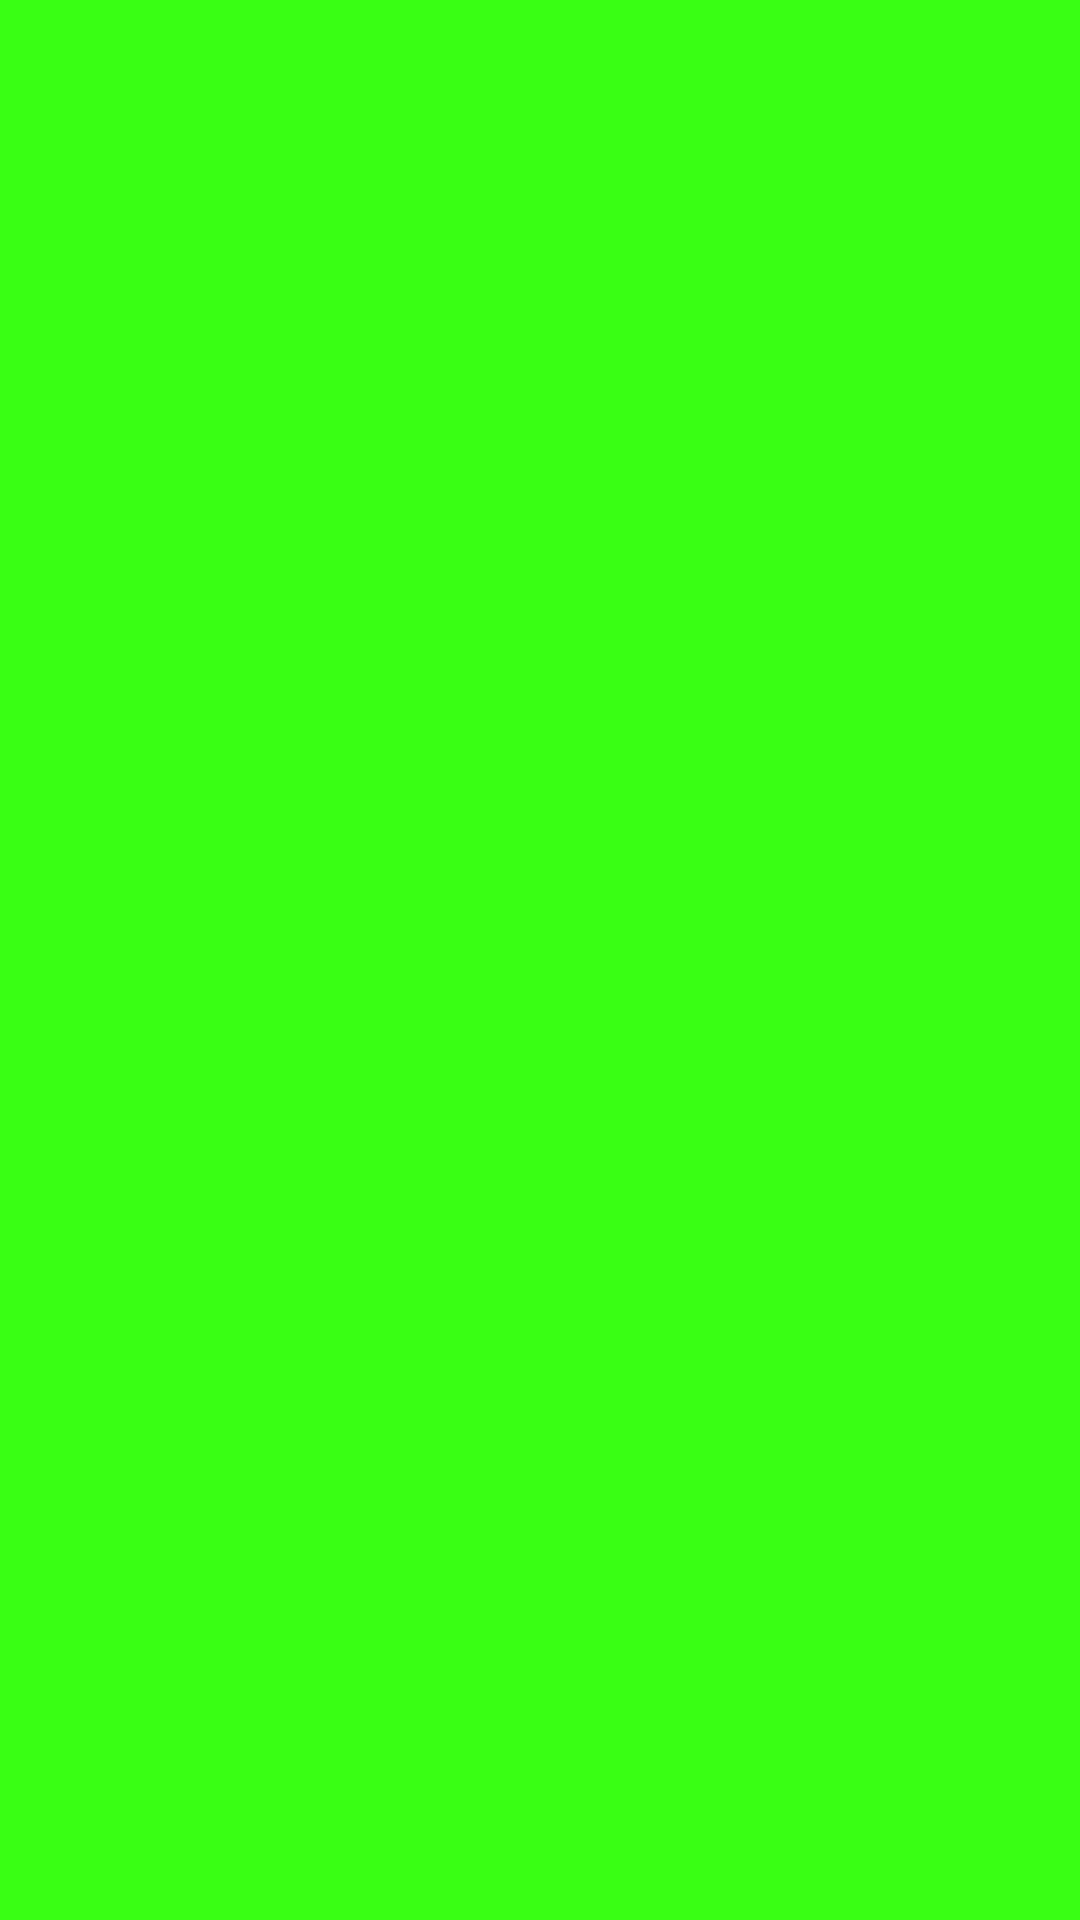 Res: 1080x1920, http://wallpaperformobile.org/13944/neon-green-wallpaper.